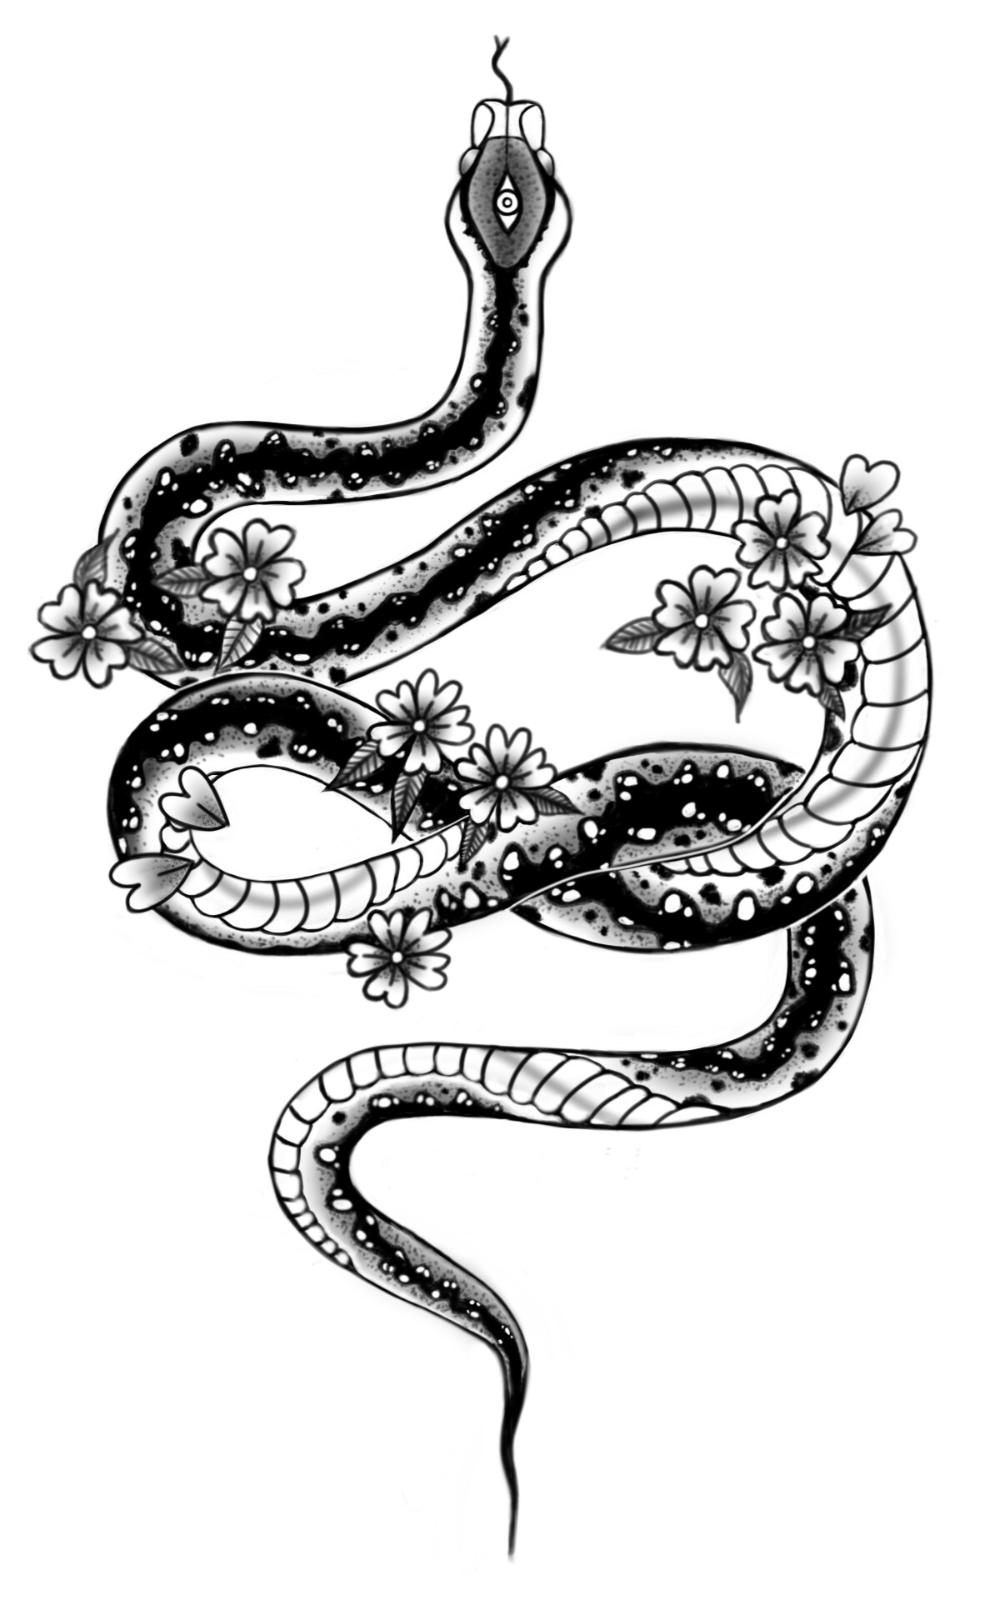 Snake Tattoo Designs Ellen Beuting Snake Tattoo Design Snake Tattoo Ankel Tattoos